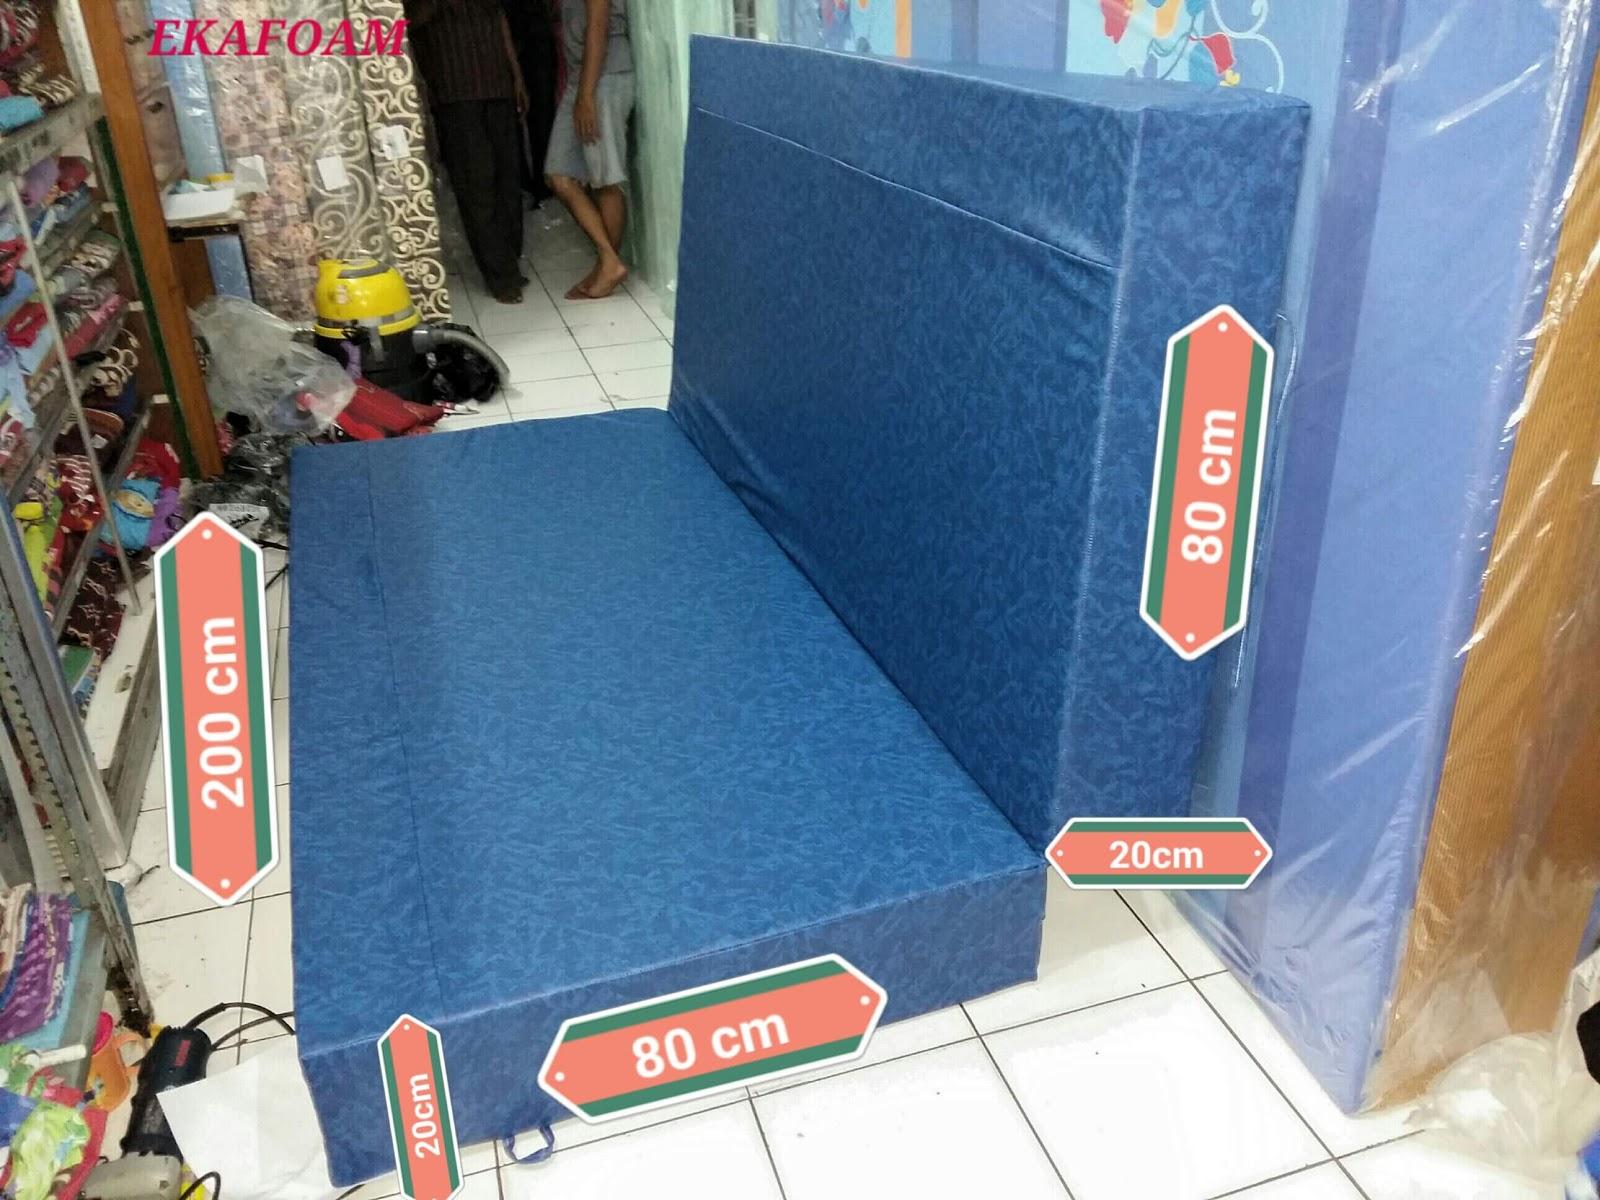 Sofa Bed Kasur Busa Lipat Inoac Jakarta Mah Jong Replica September 2016 Agen Jual Ef